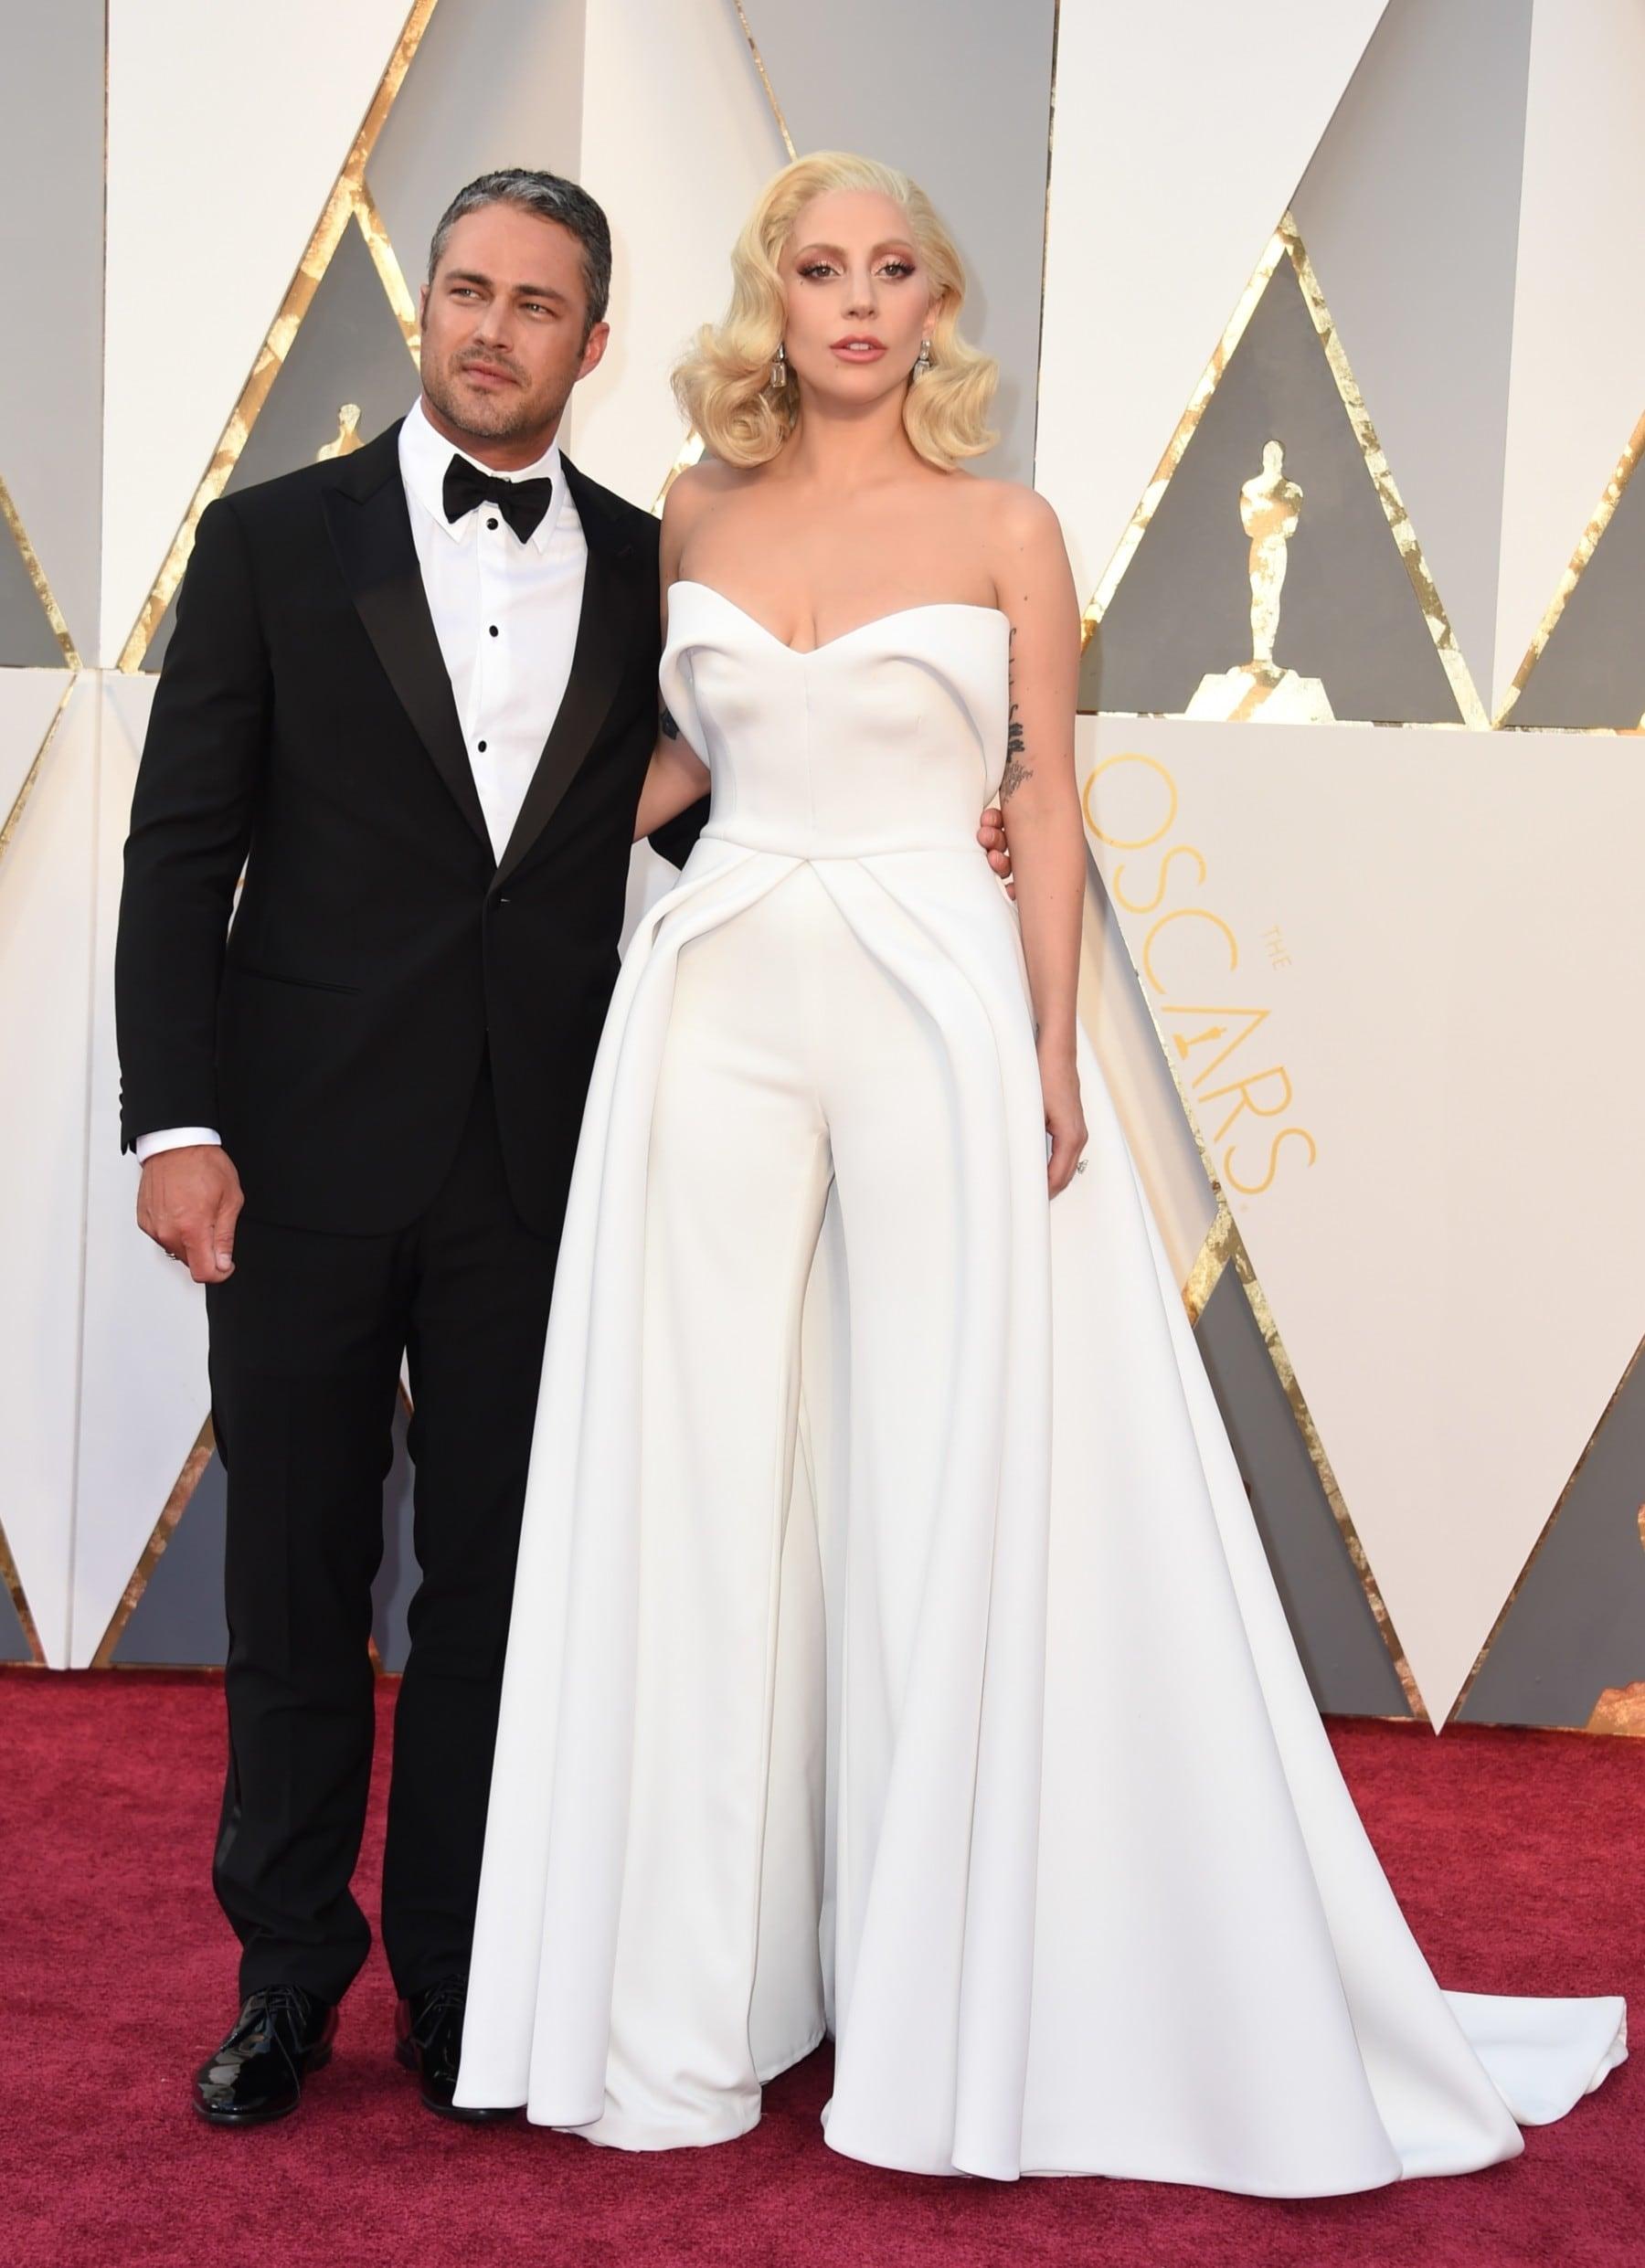 Lady Gaga is wearing Brandon Maxwell to the 2016 Oscars - Vogue ... 1924548b0